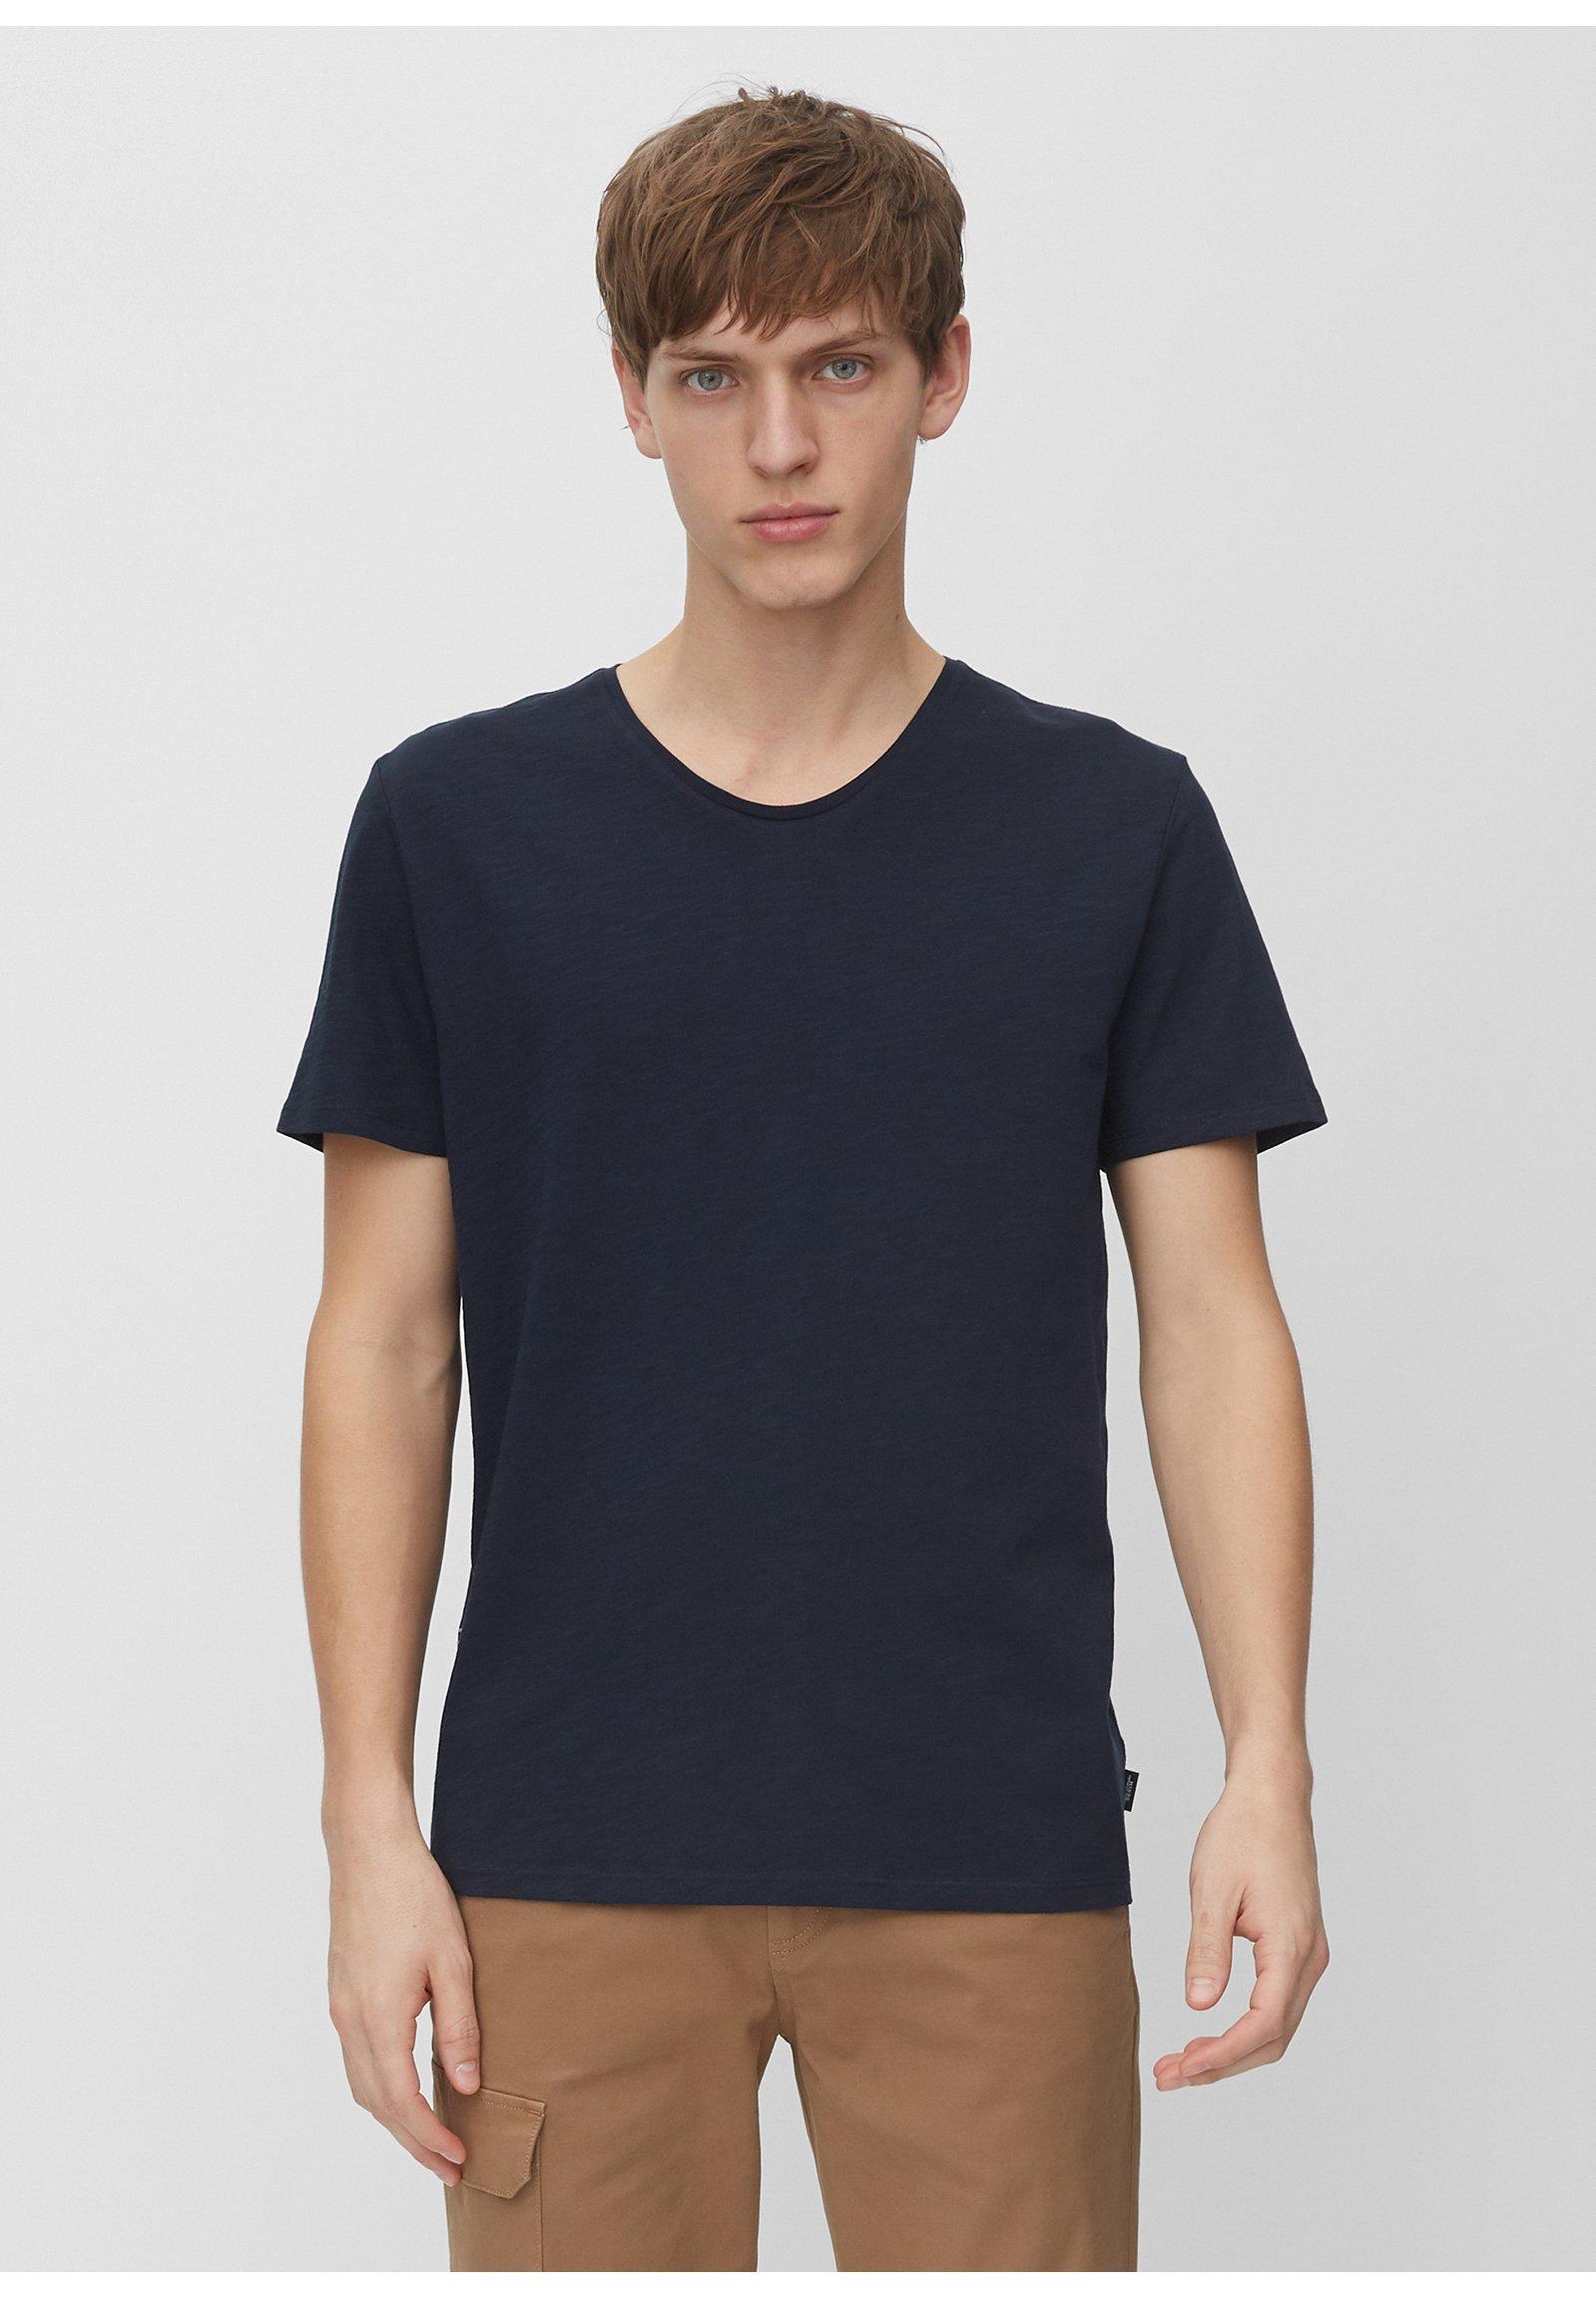 Marc O'Polo DENIM MARC O'POLO DENIM T-SHIRT AUS ORGANIC COTTON-SLUB-JERSEY - T-shirt basic - scandinavian blue